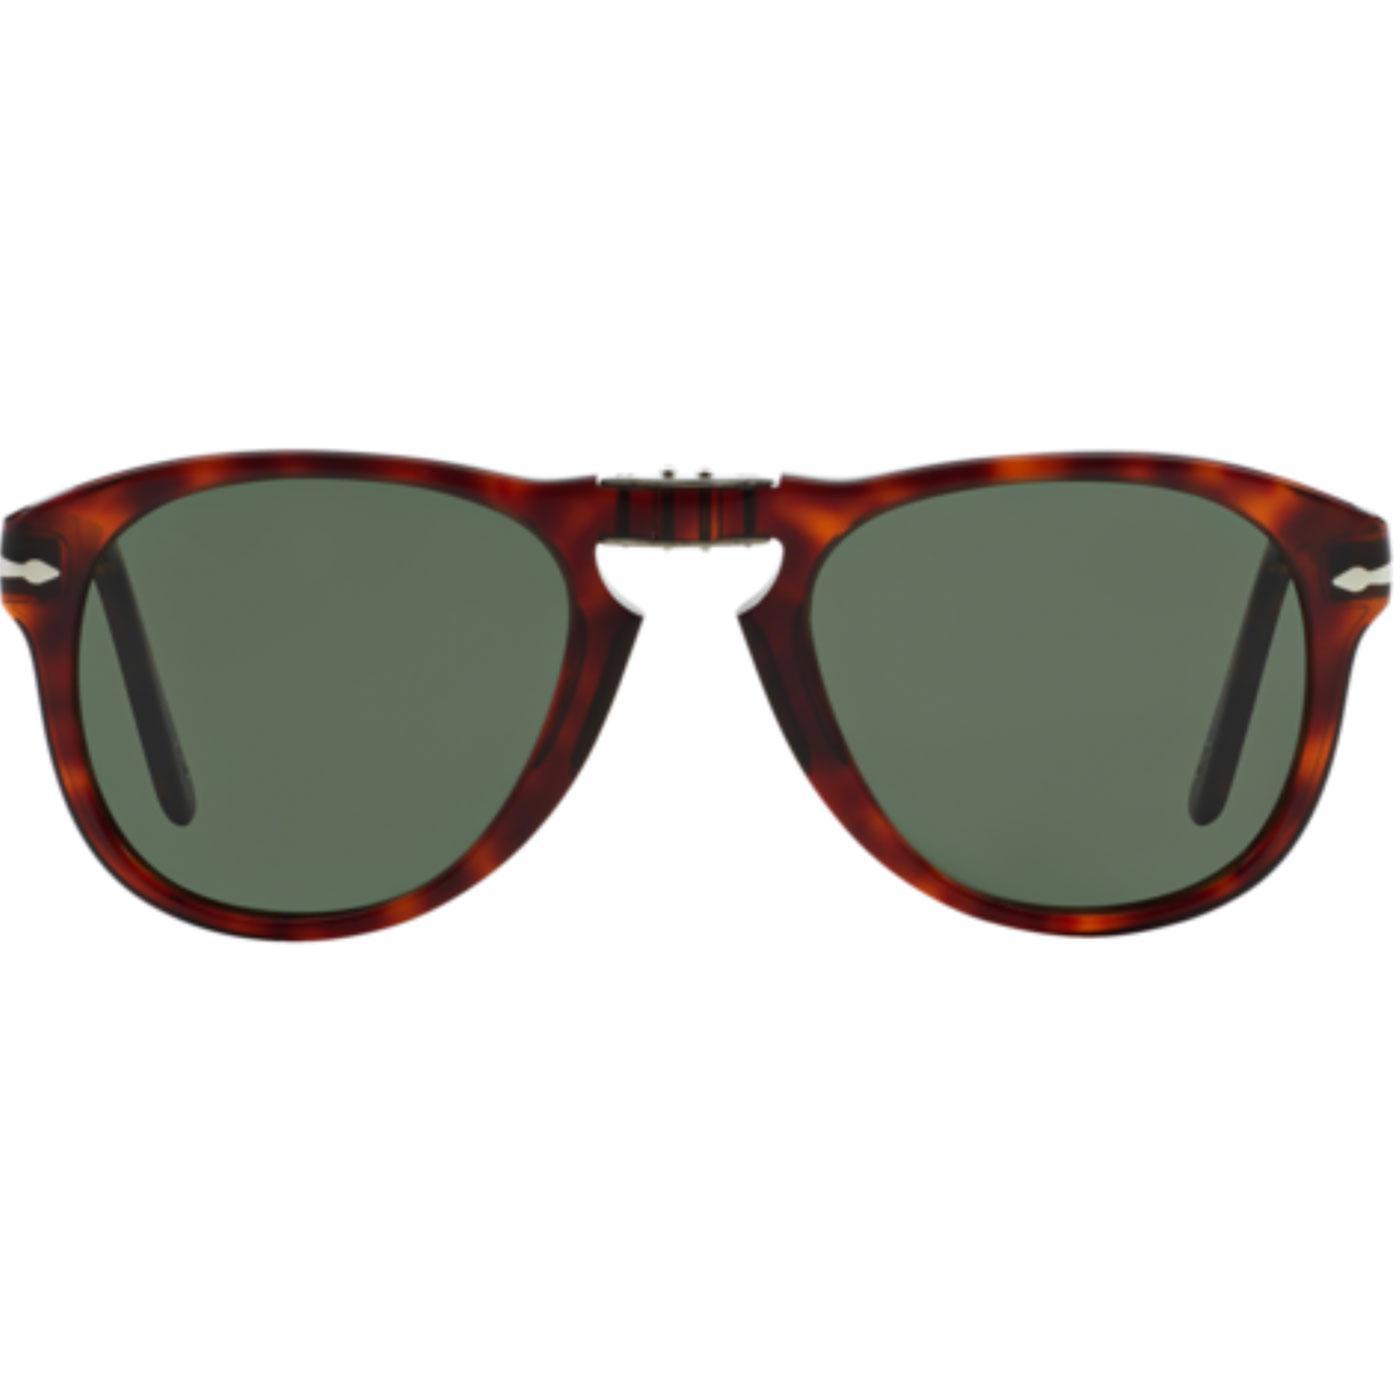 bba85ad8c3567 PERSOL Folding 714 Series Men s Mod Sunglasses in Havana